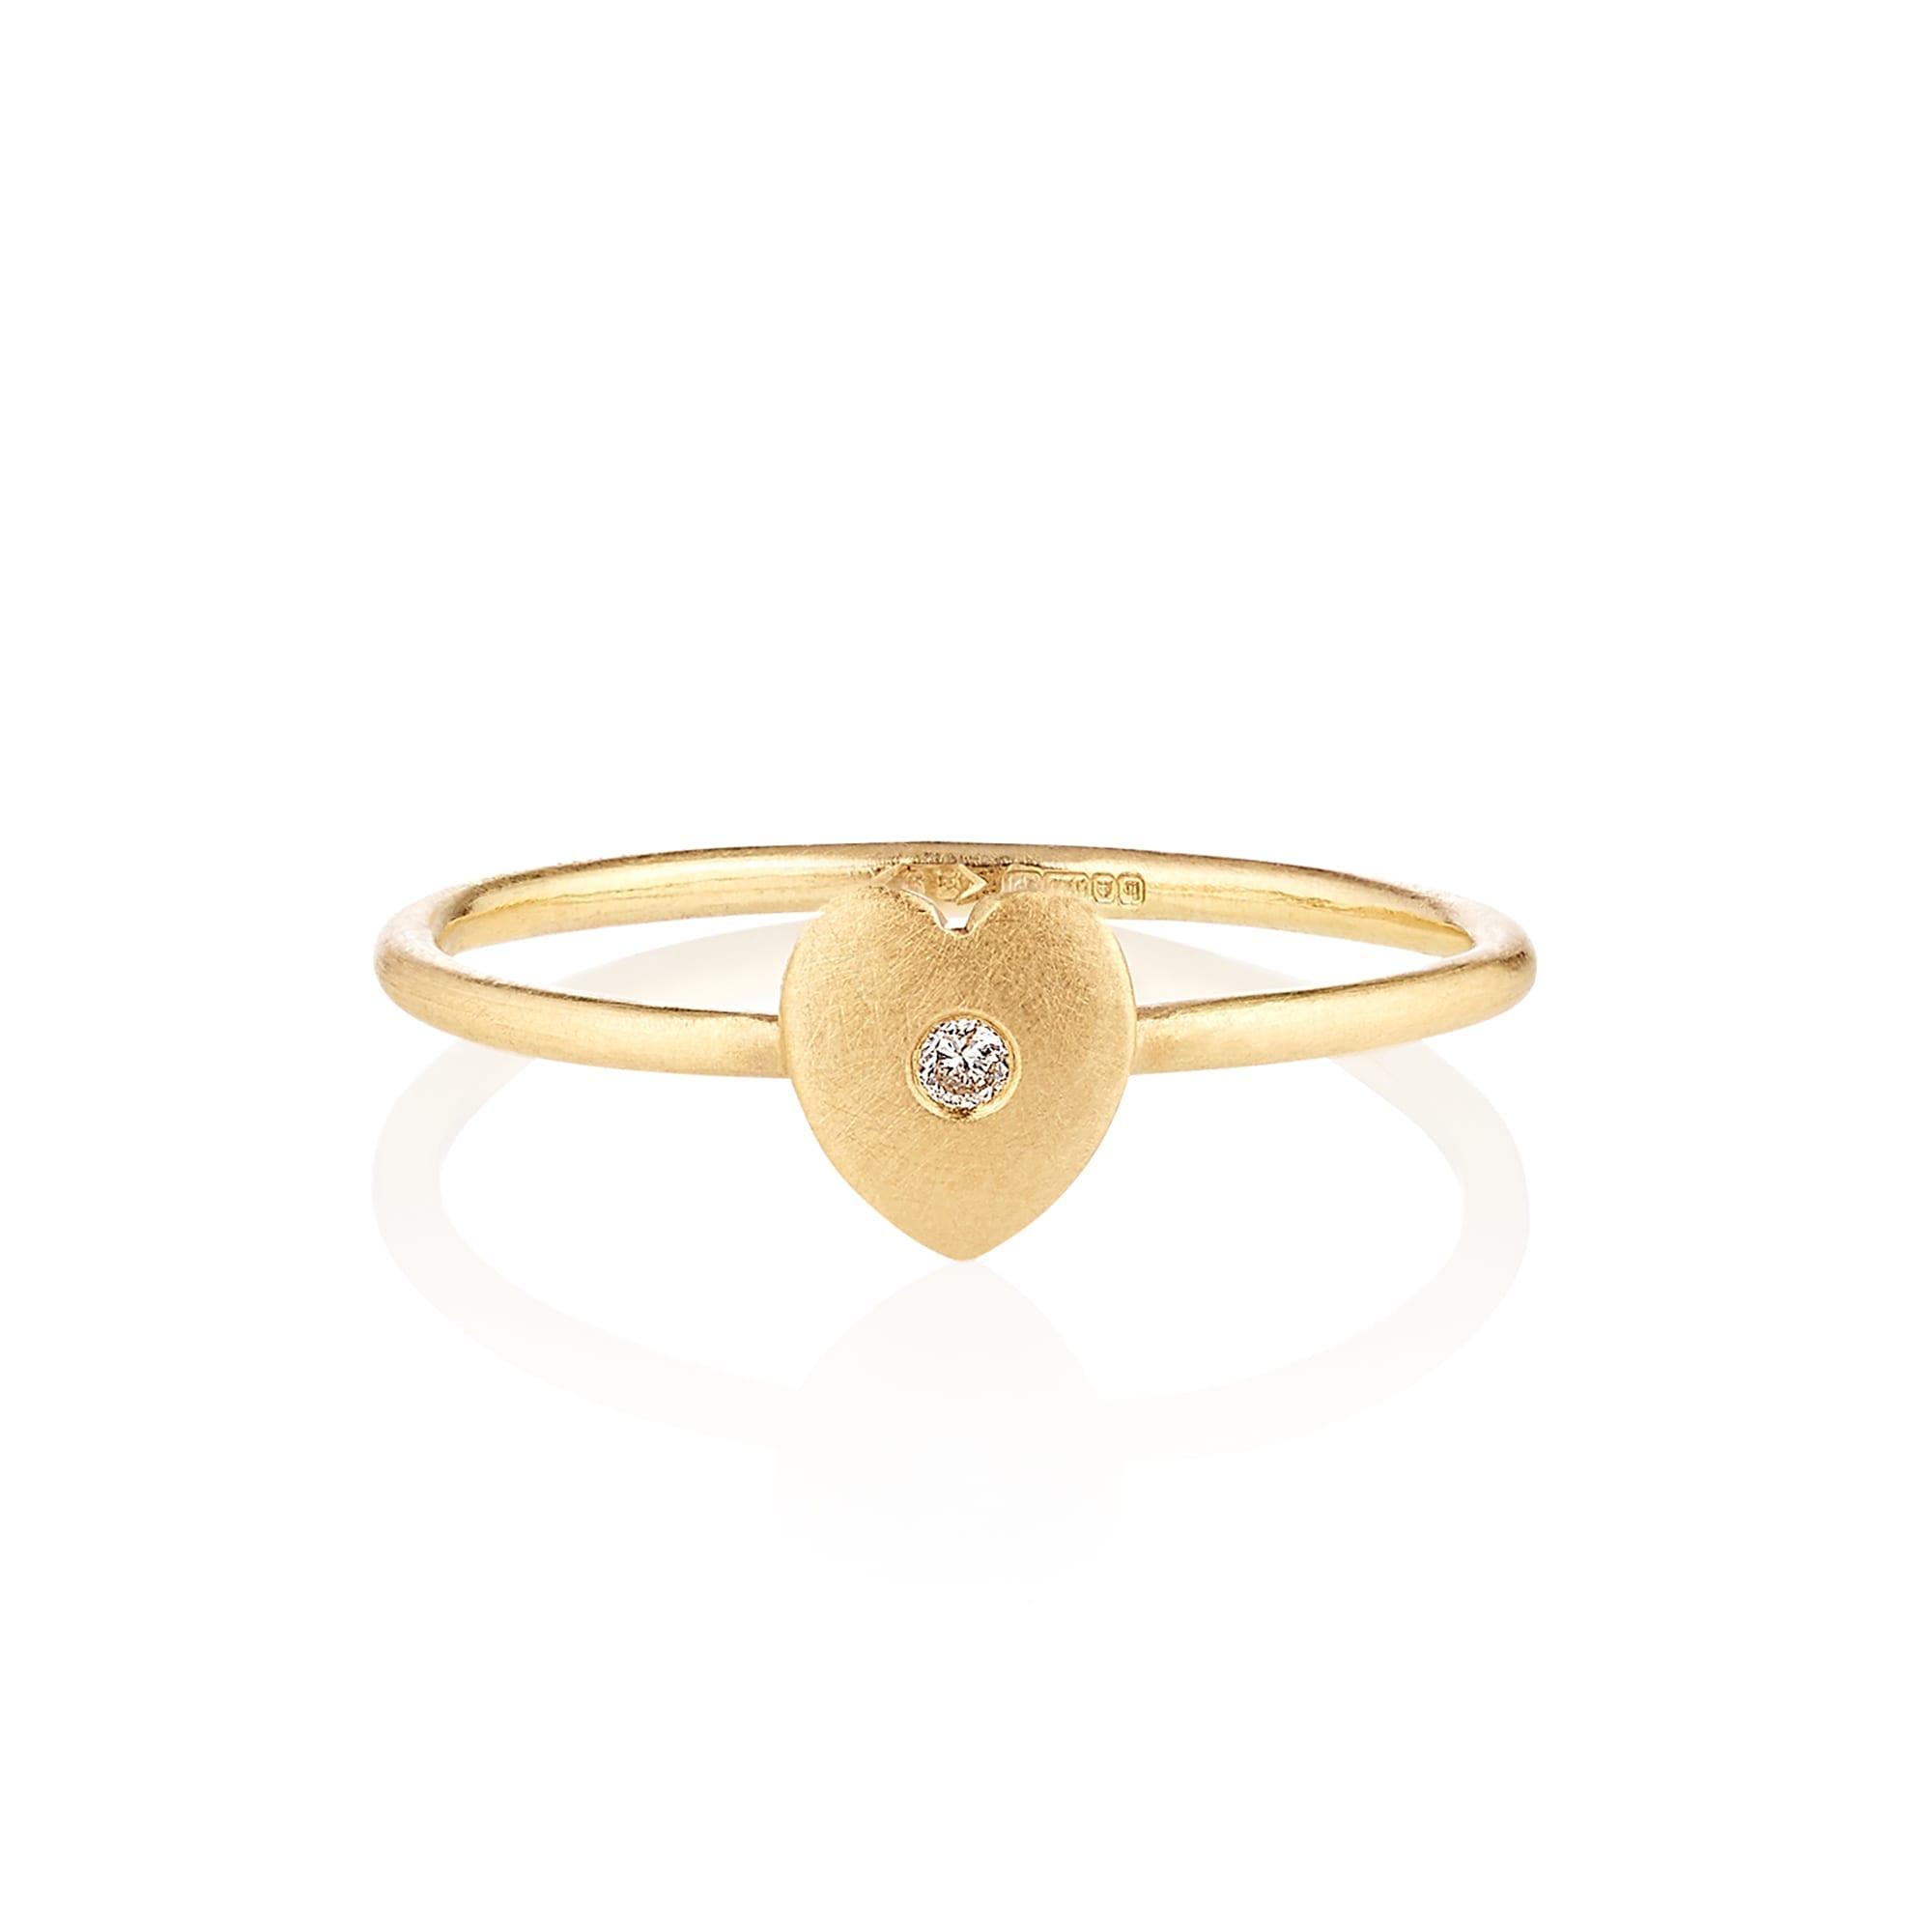 Cherish-Diamond ethical ring with gold heart and CanadaMark Diamond